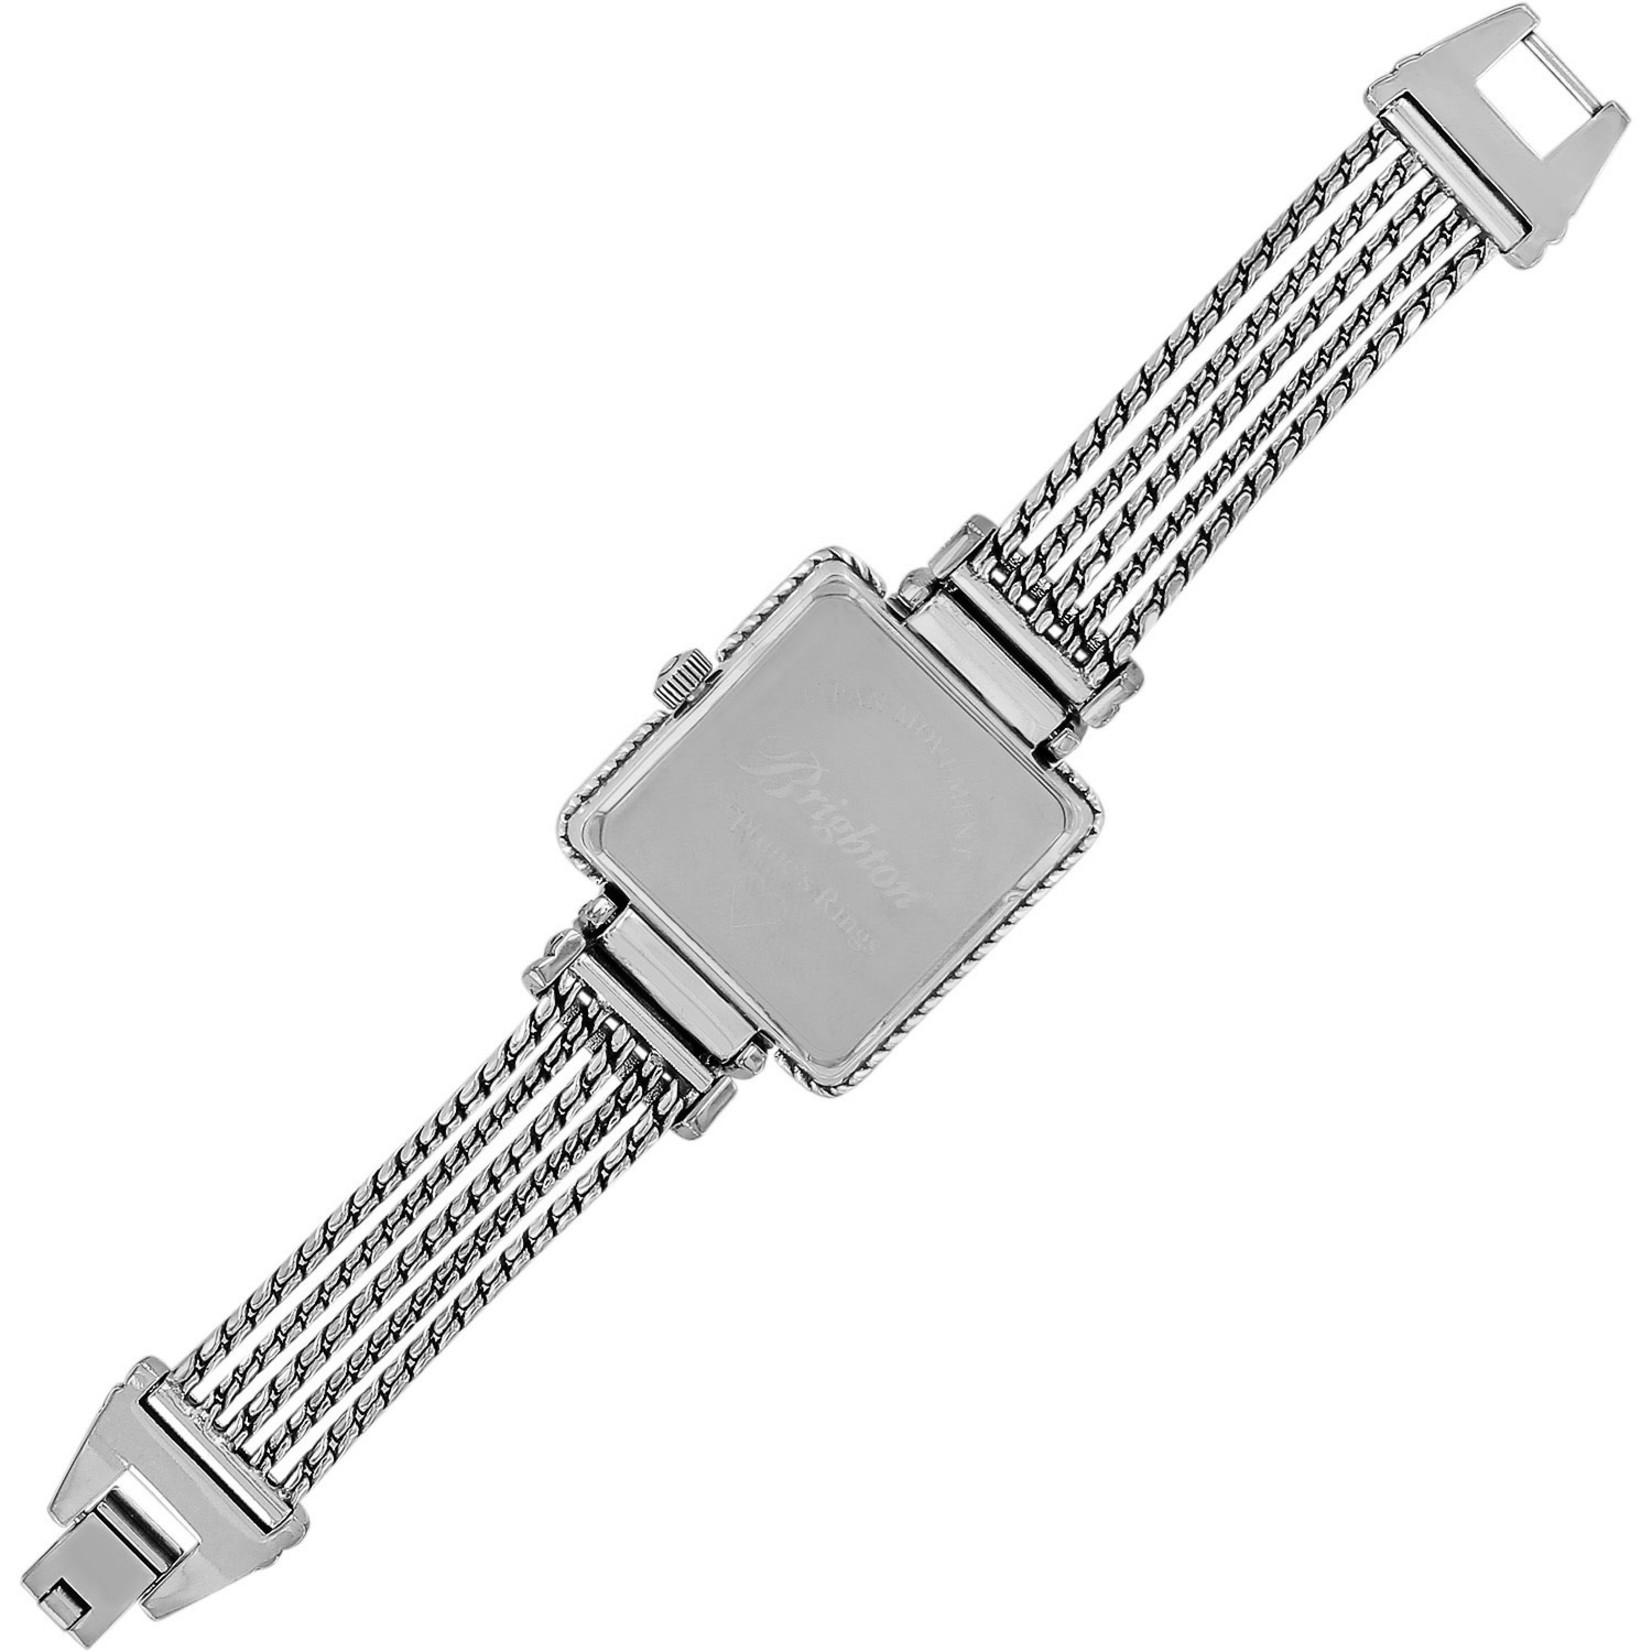 Brighton W10432 Neptune's Rings Watch